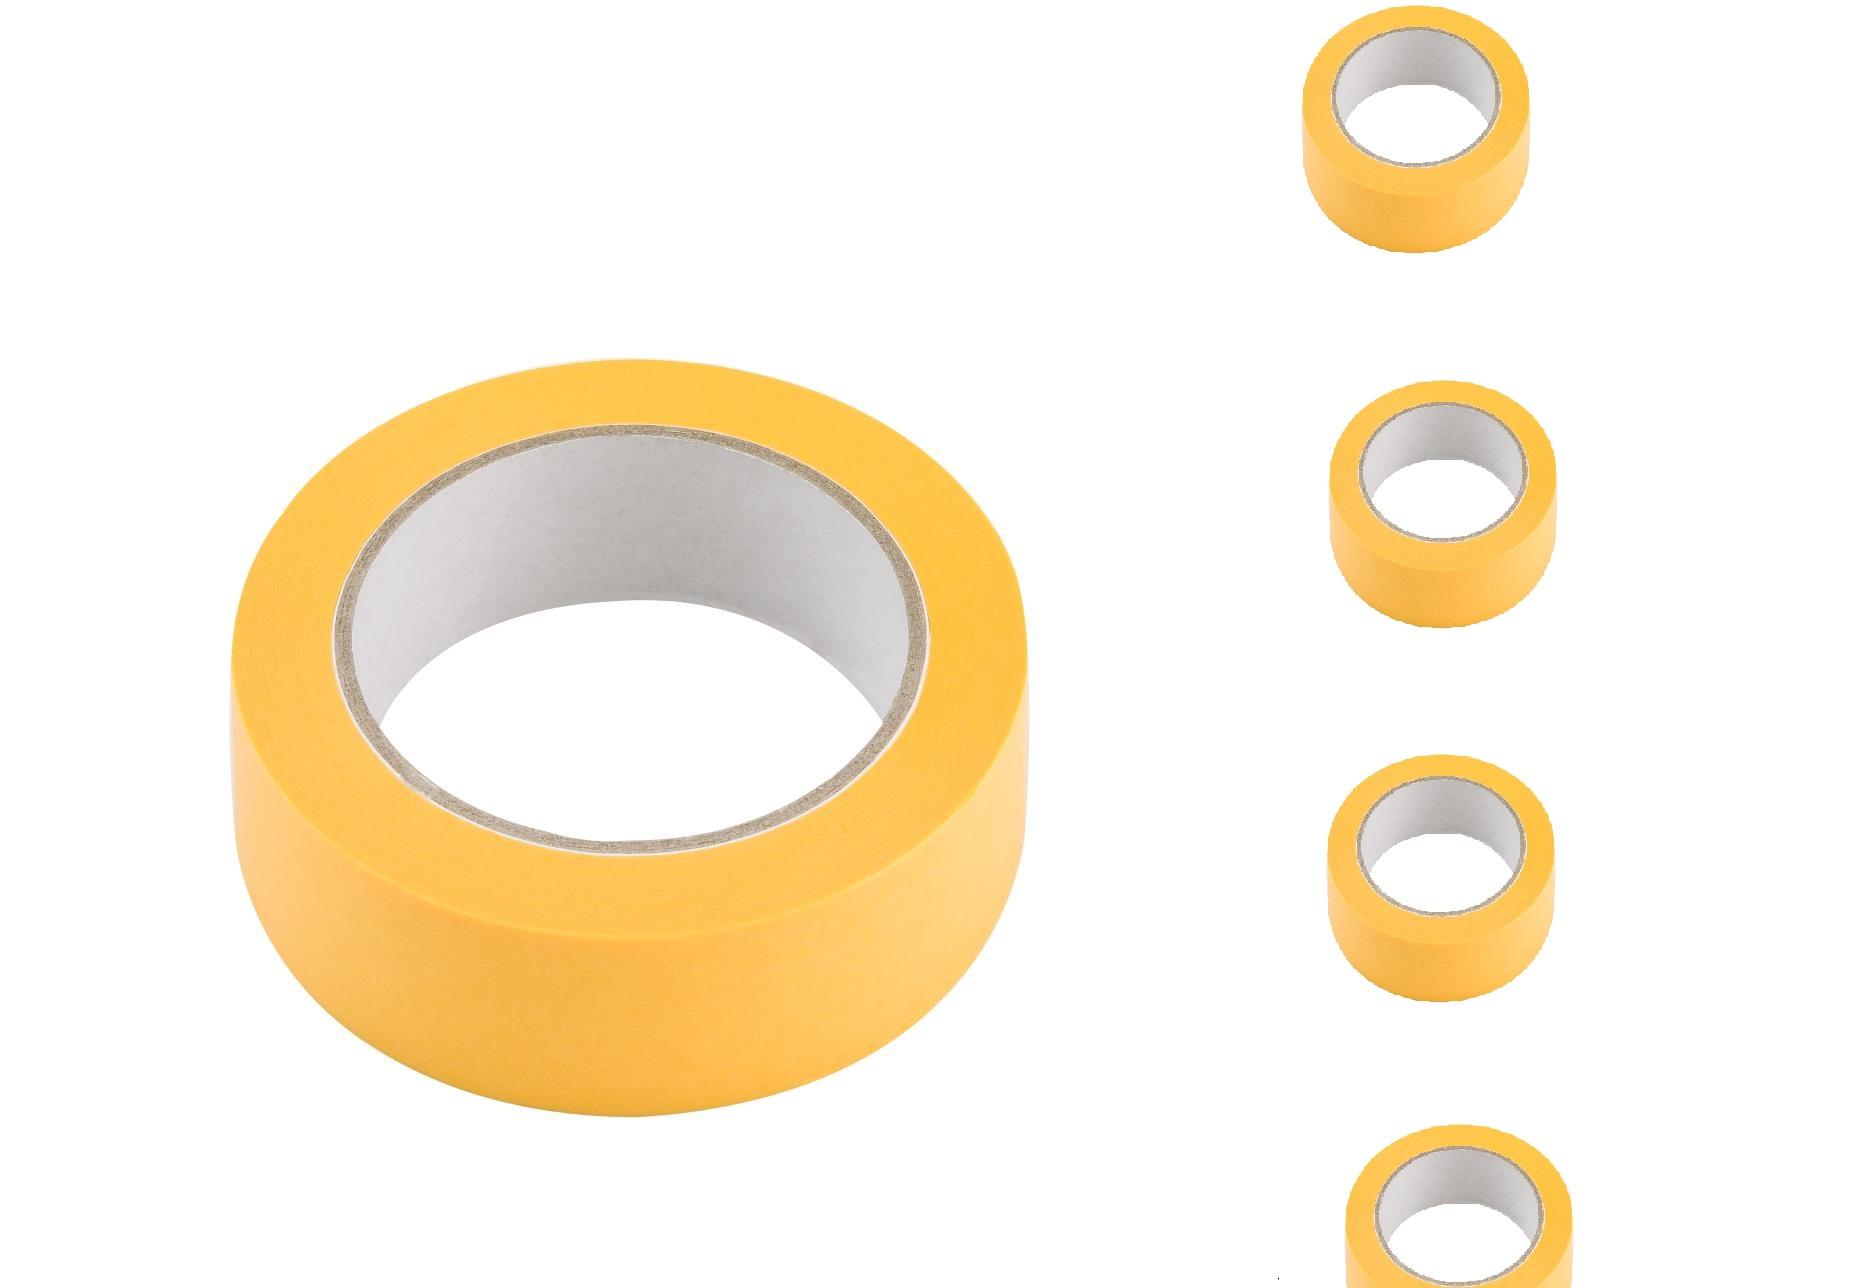 12  Rollen Goldband PLUS 30mmx50m Malerklebeband Malerkrepp Klebeband Tape